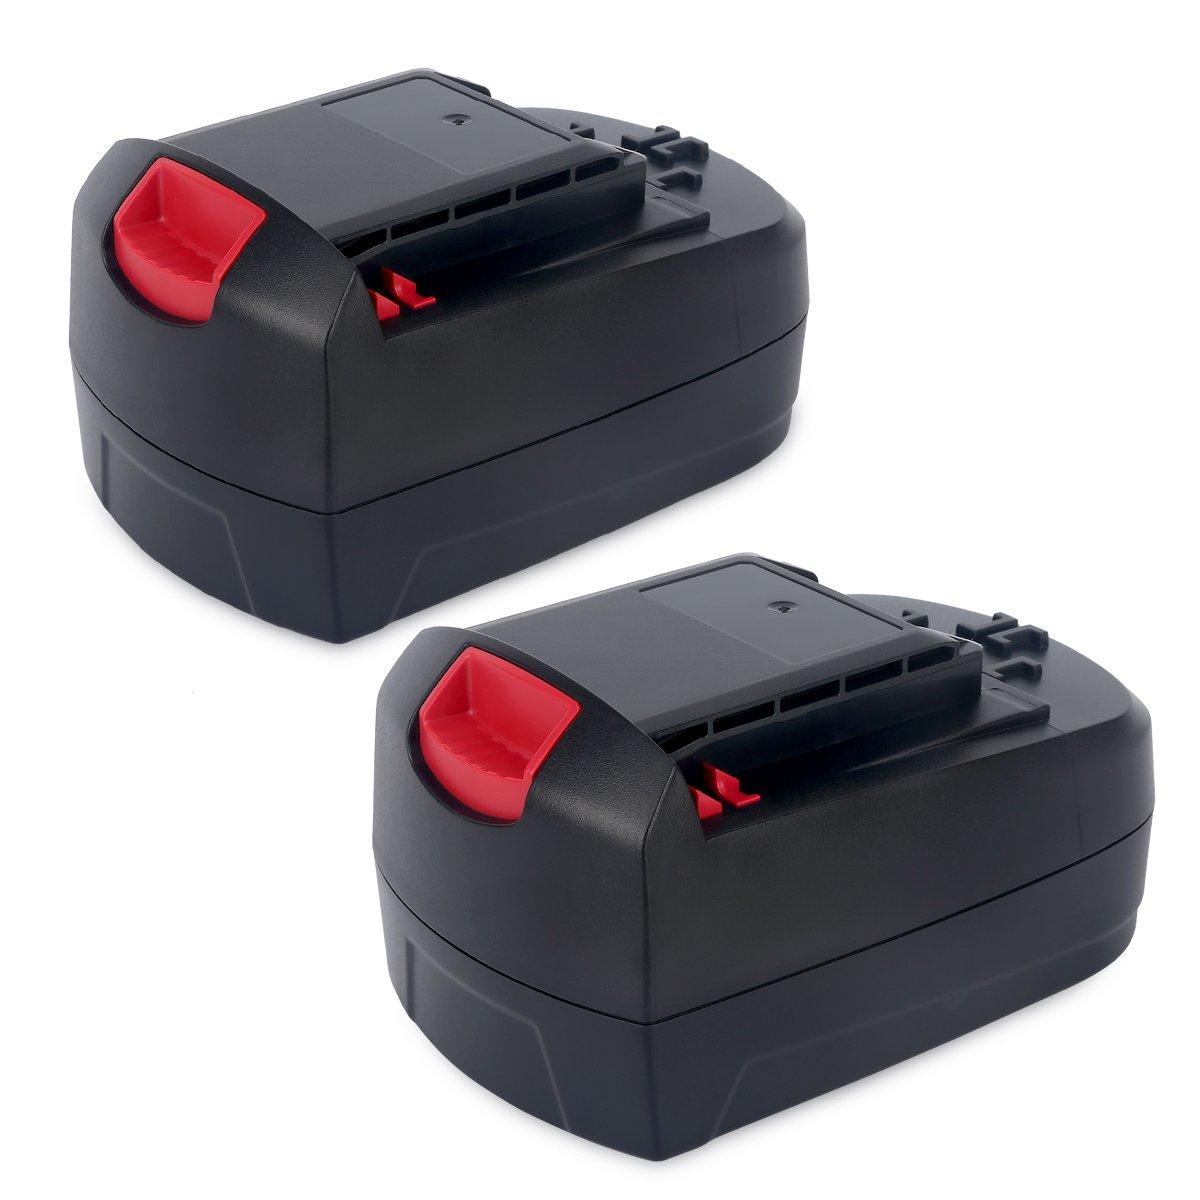 Biswaye 2Pack 18V Battery SB18C SB18A SB18B for Skil 18V Select System Cordless Tools 2810 2888 2895 2897 2898 4570 5850 5995 7305 9350, 3000mAh Ni-Cd by Biswaye (Image #1)